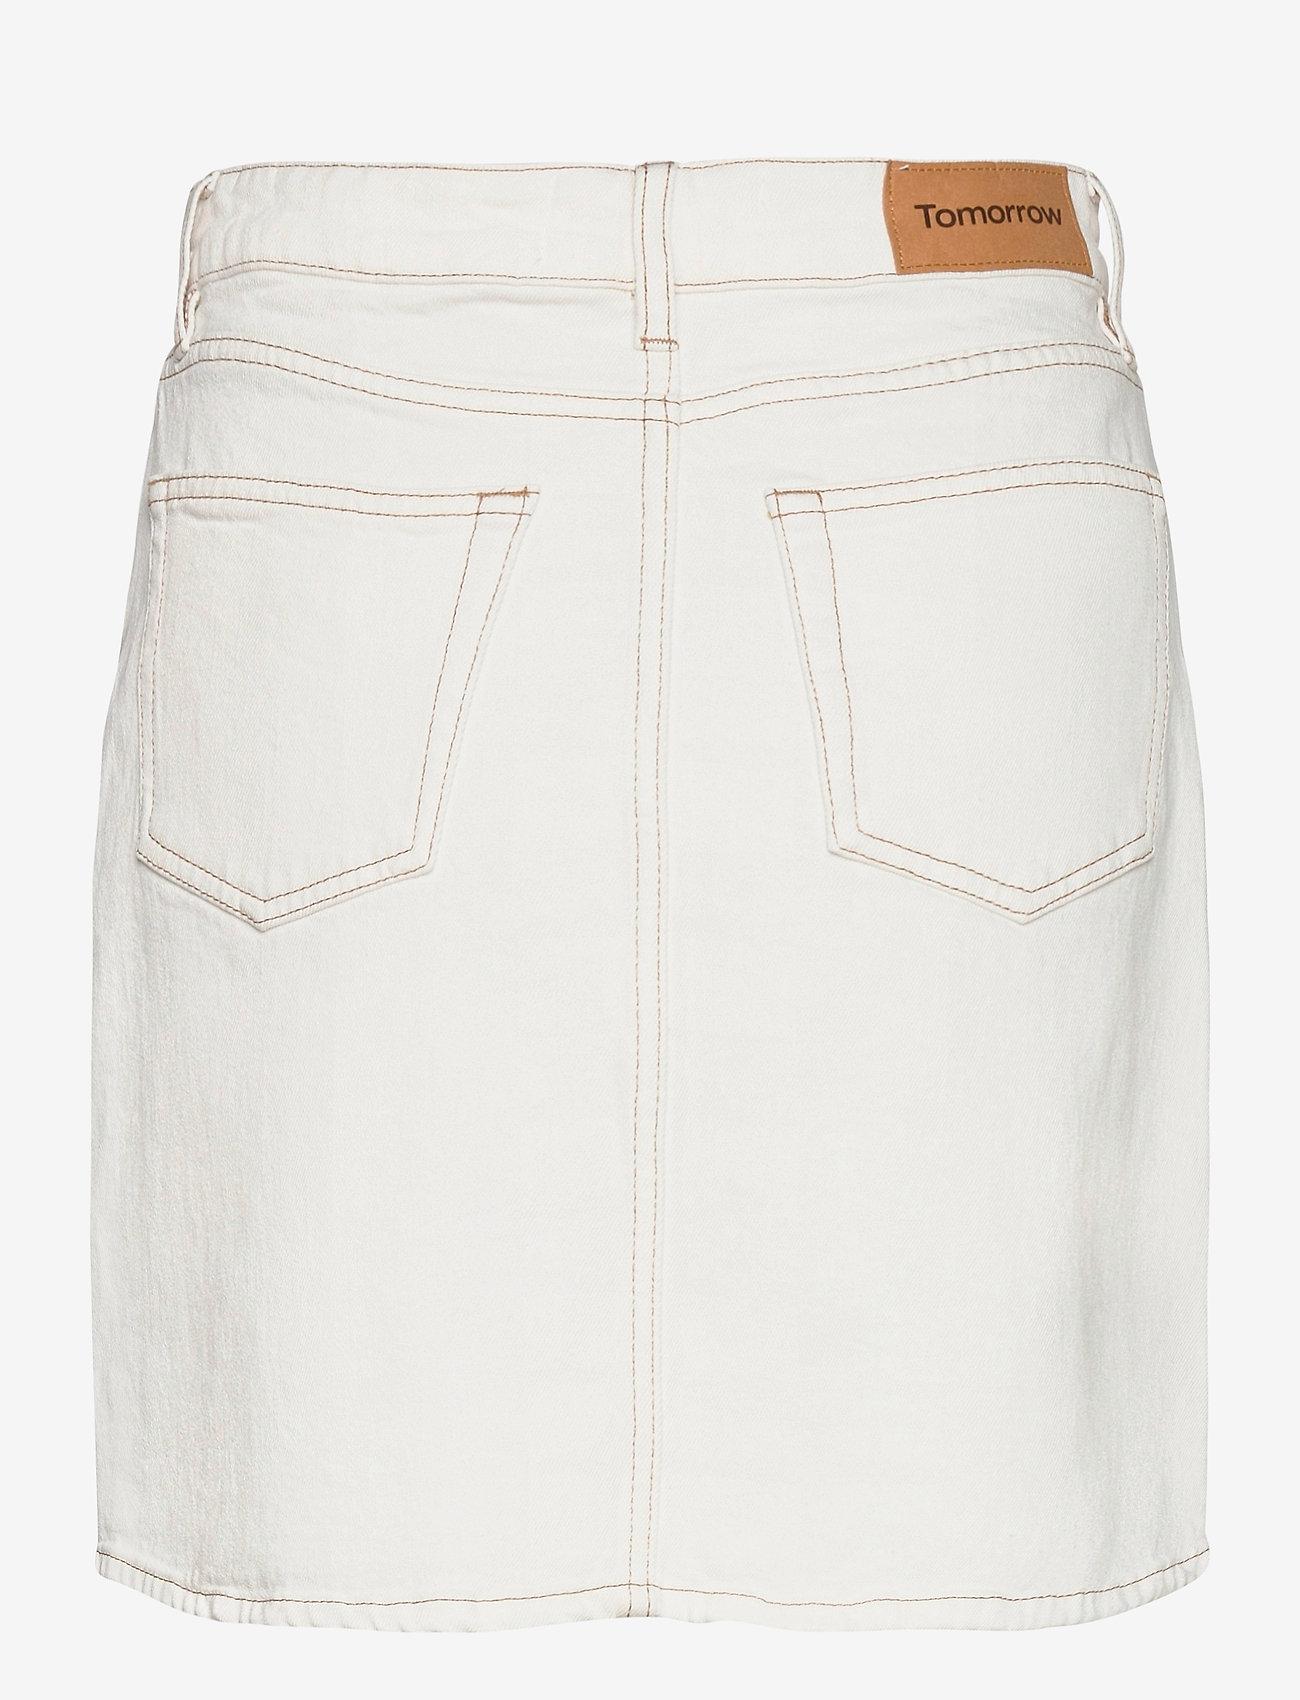 Tomorrow - Mandela denim skirt color - kurze röcke - ecru - 1